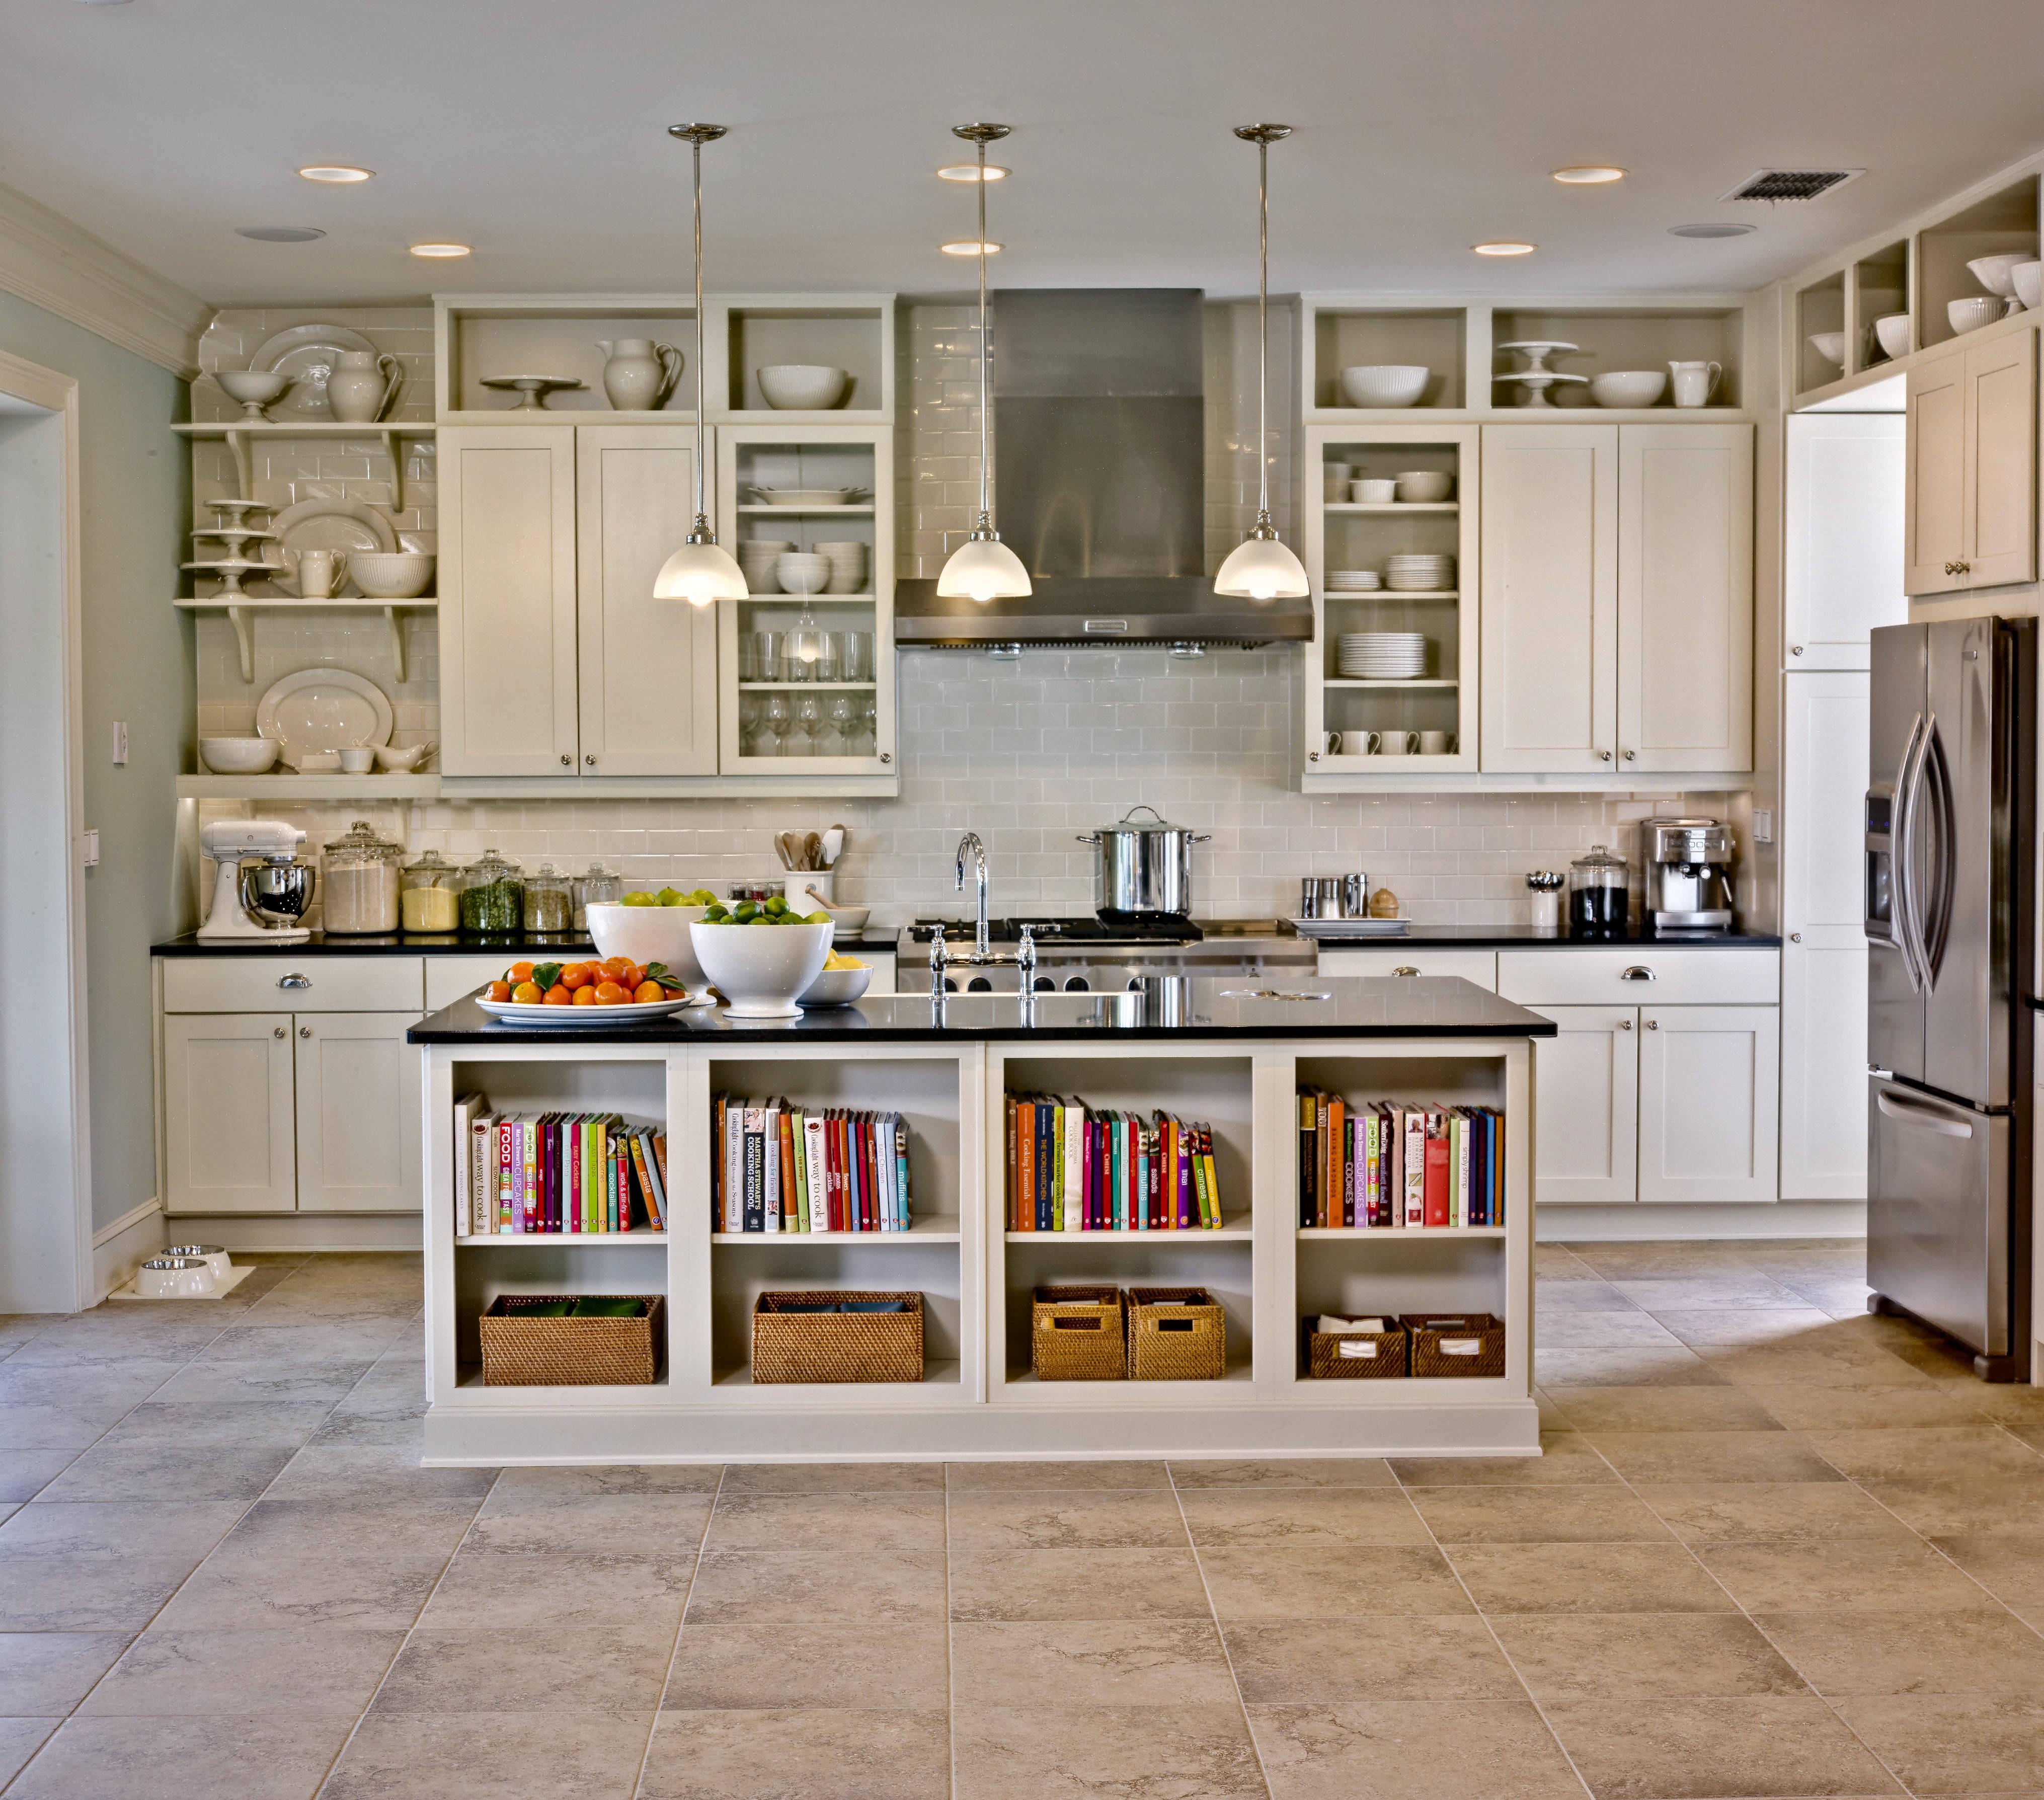 Home depot kitchen pantry photo - 3